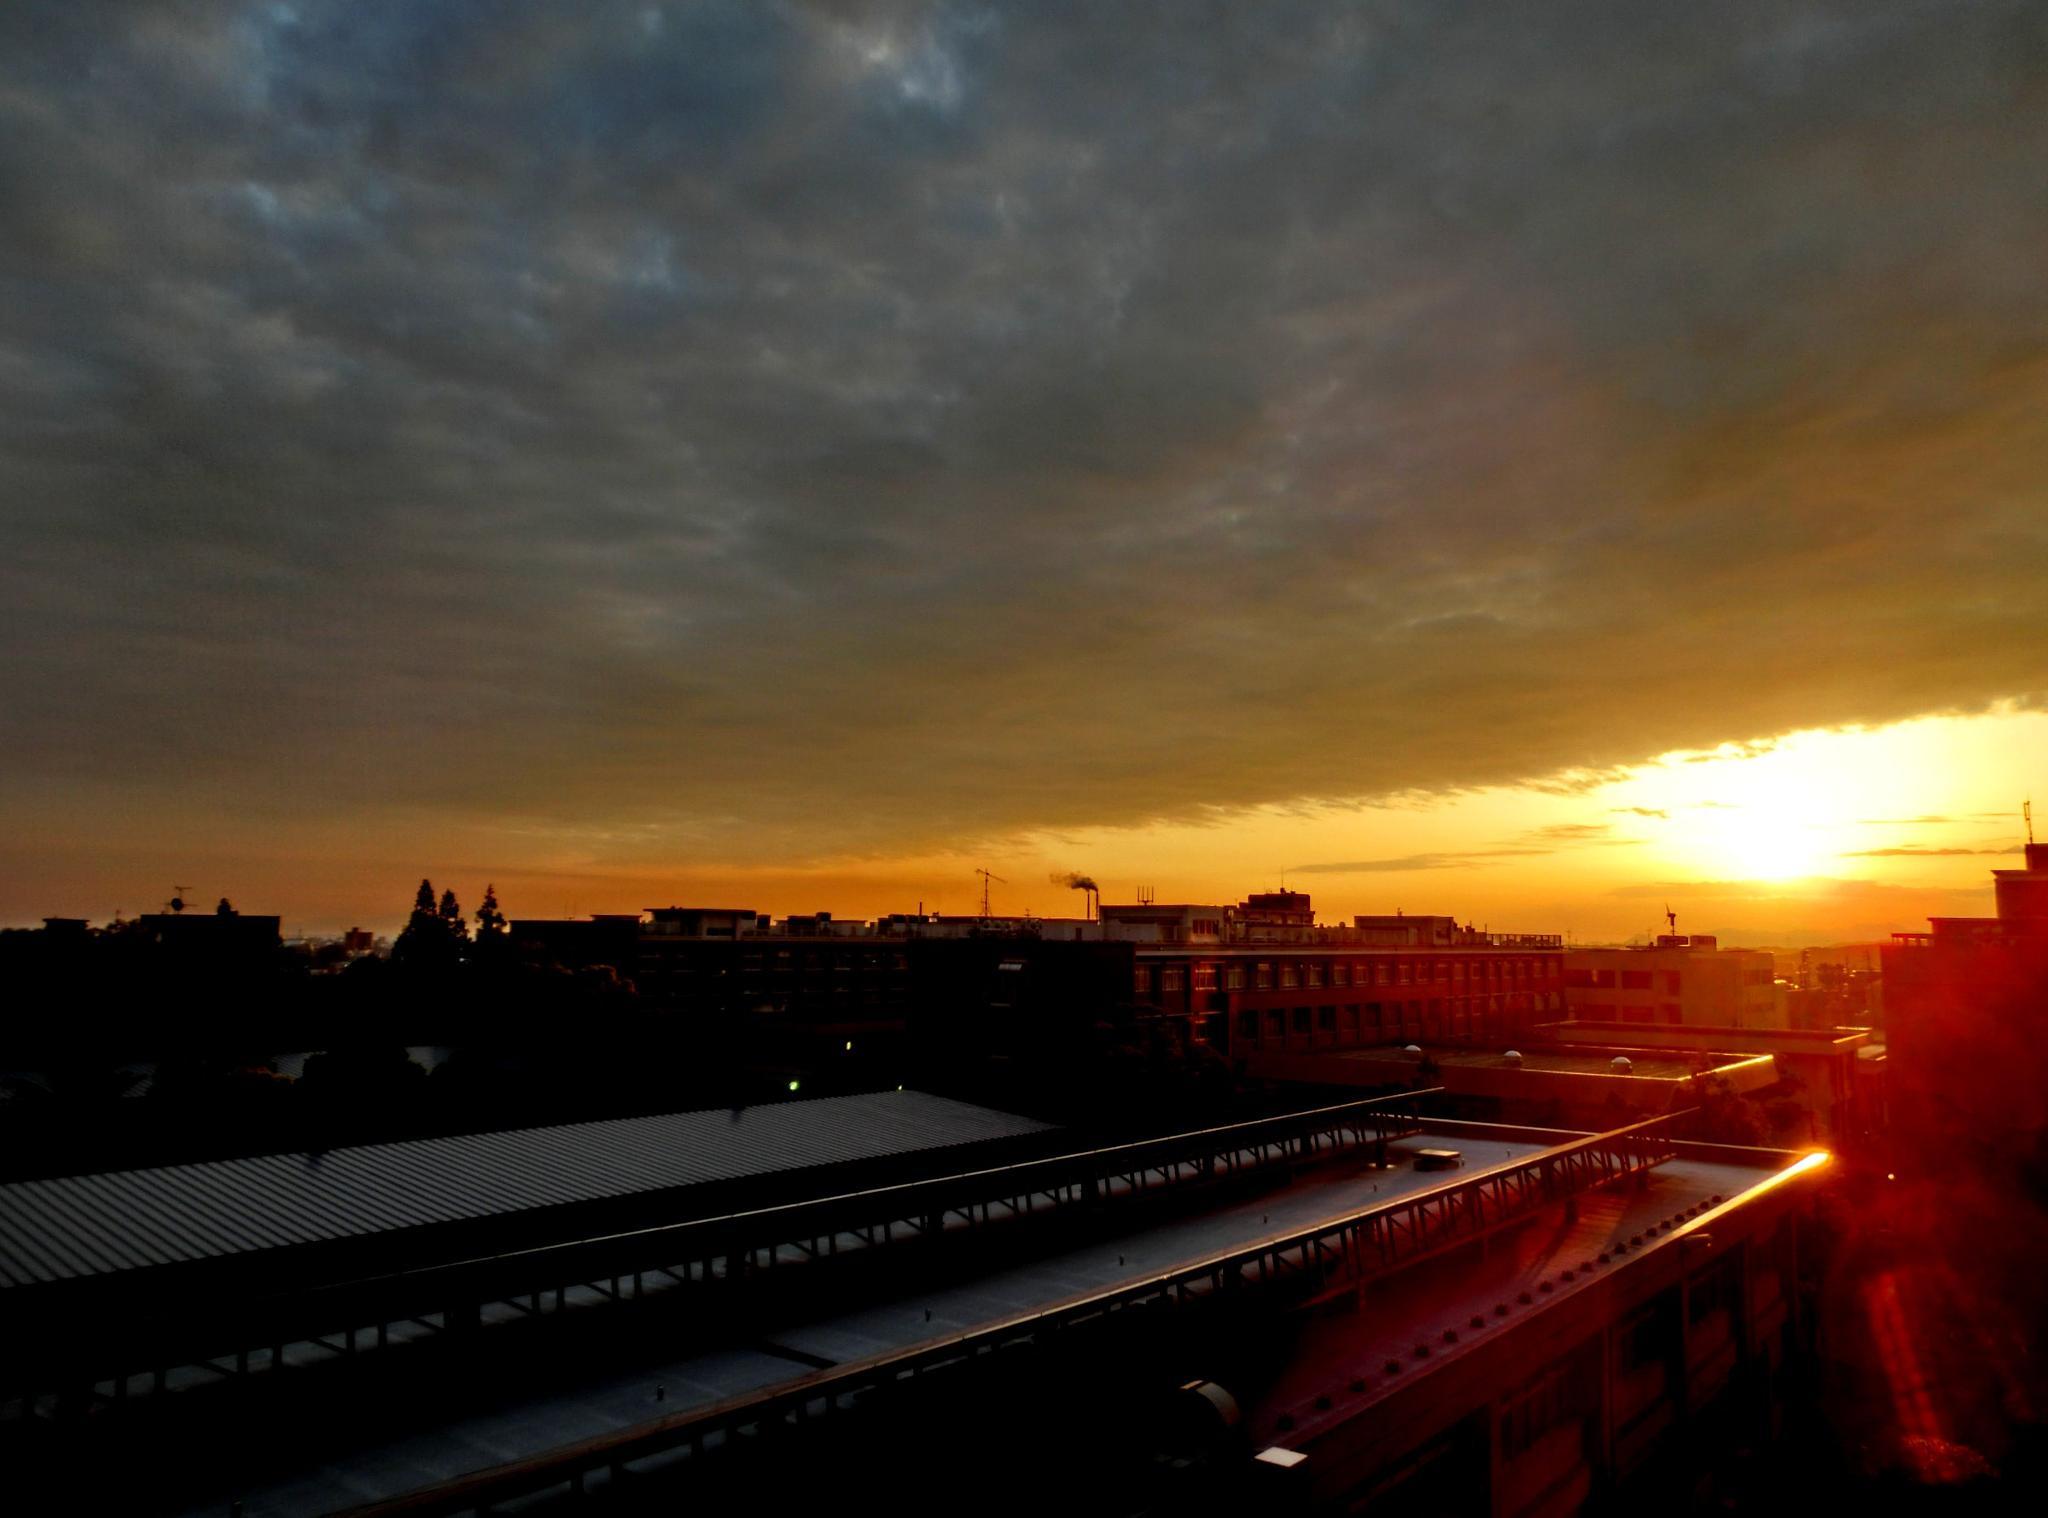 sunset by takuya.murata.14